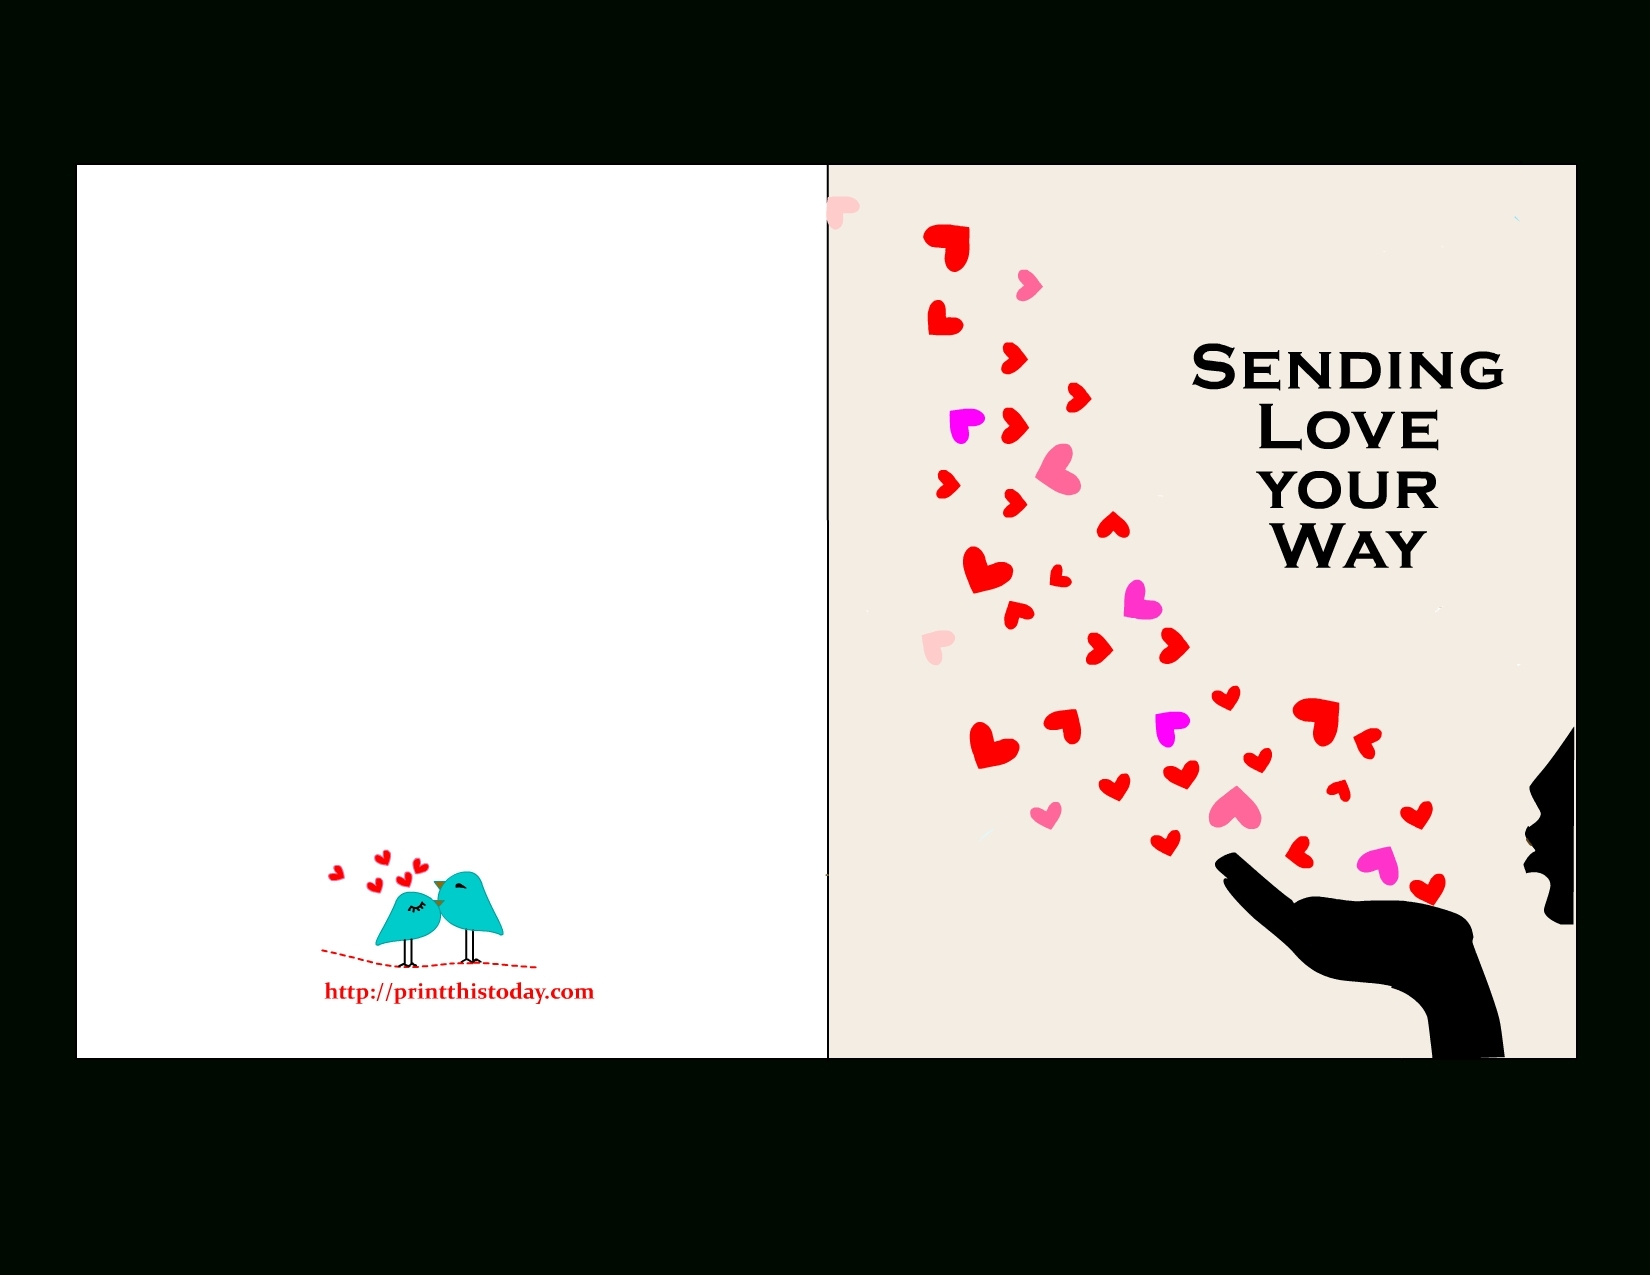 Free Printable Love Card | Tyler | Pinterest | Love Cards, Cards And - Free Printable Love Cards